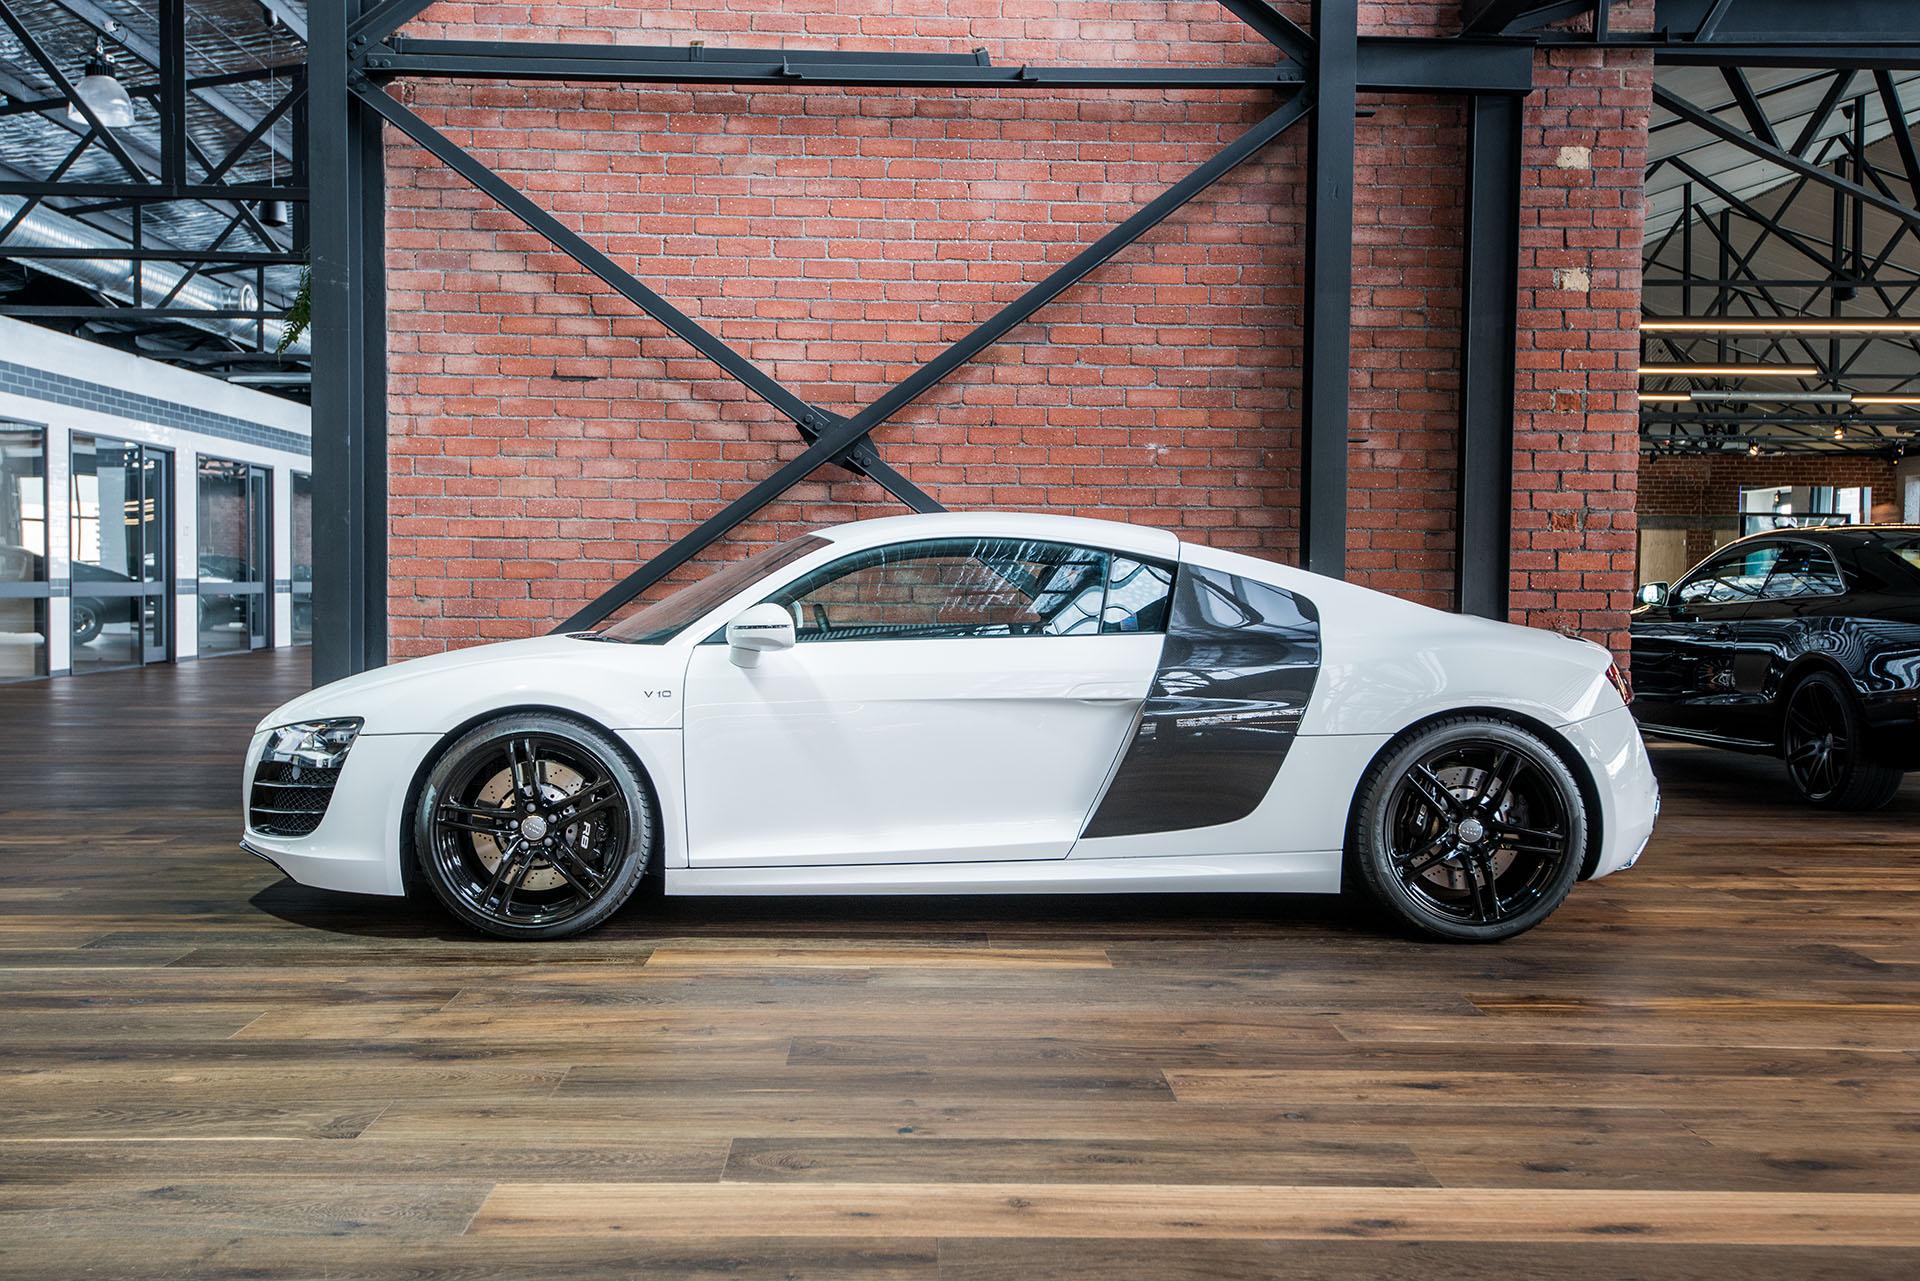 2010 Audi R8 V10 - Richmonds - Classic and Prestige Cars ...